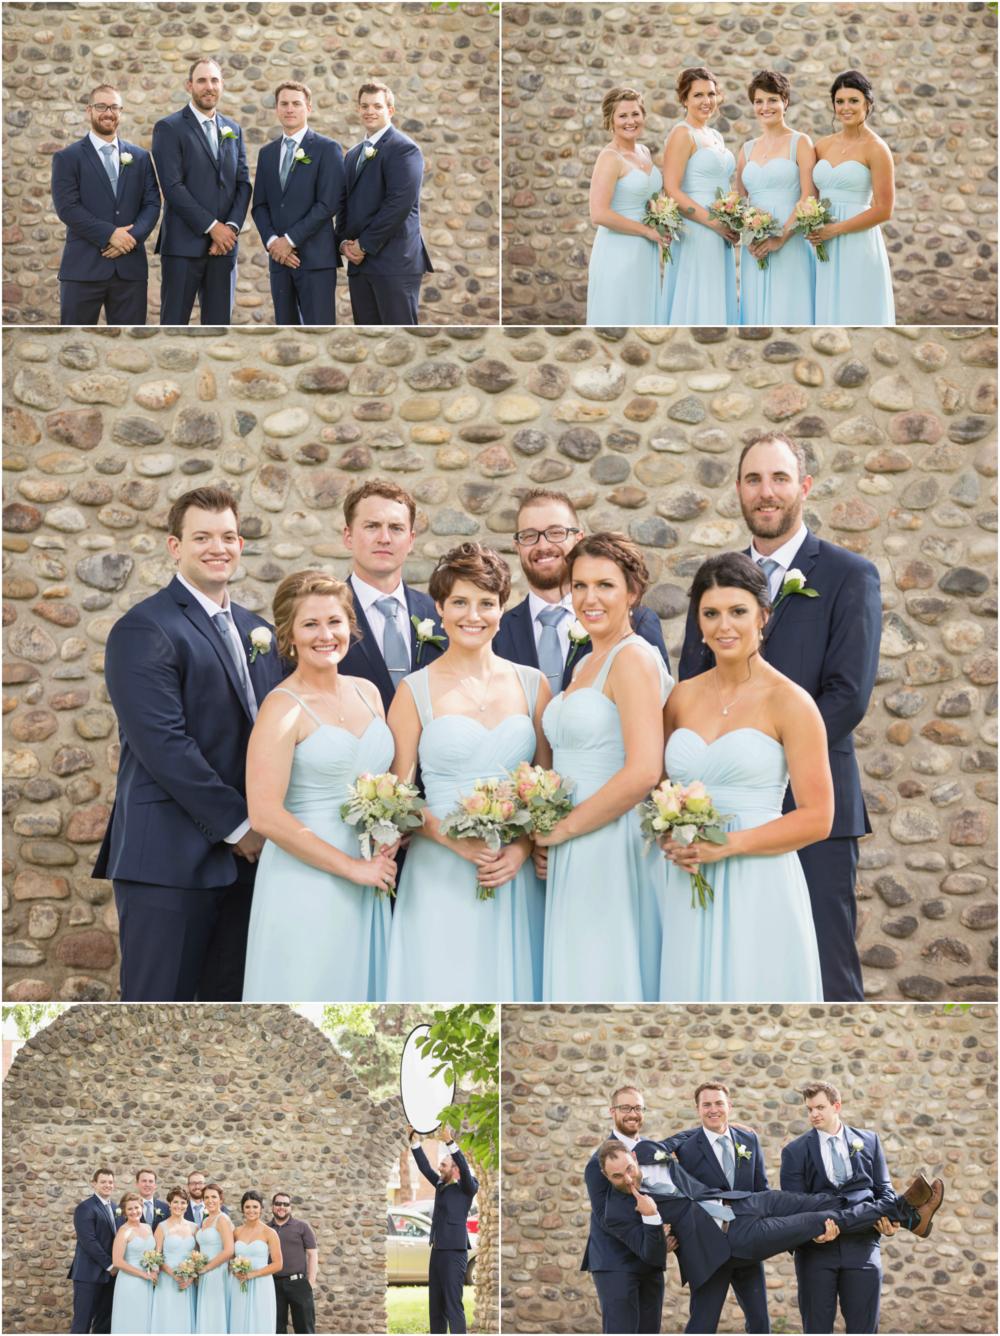 st_patricks_church_wedding_14.png